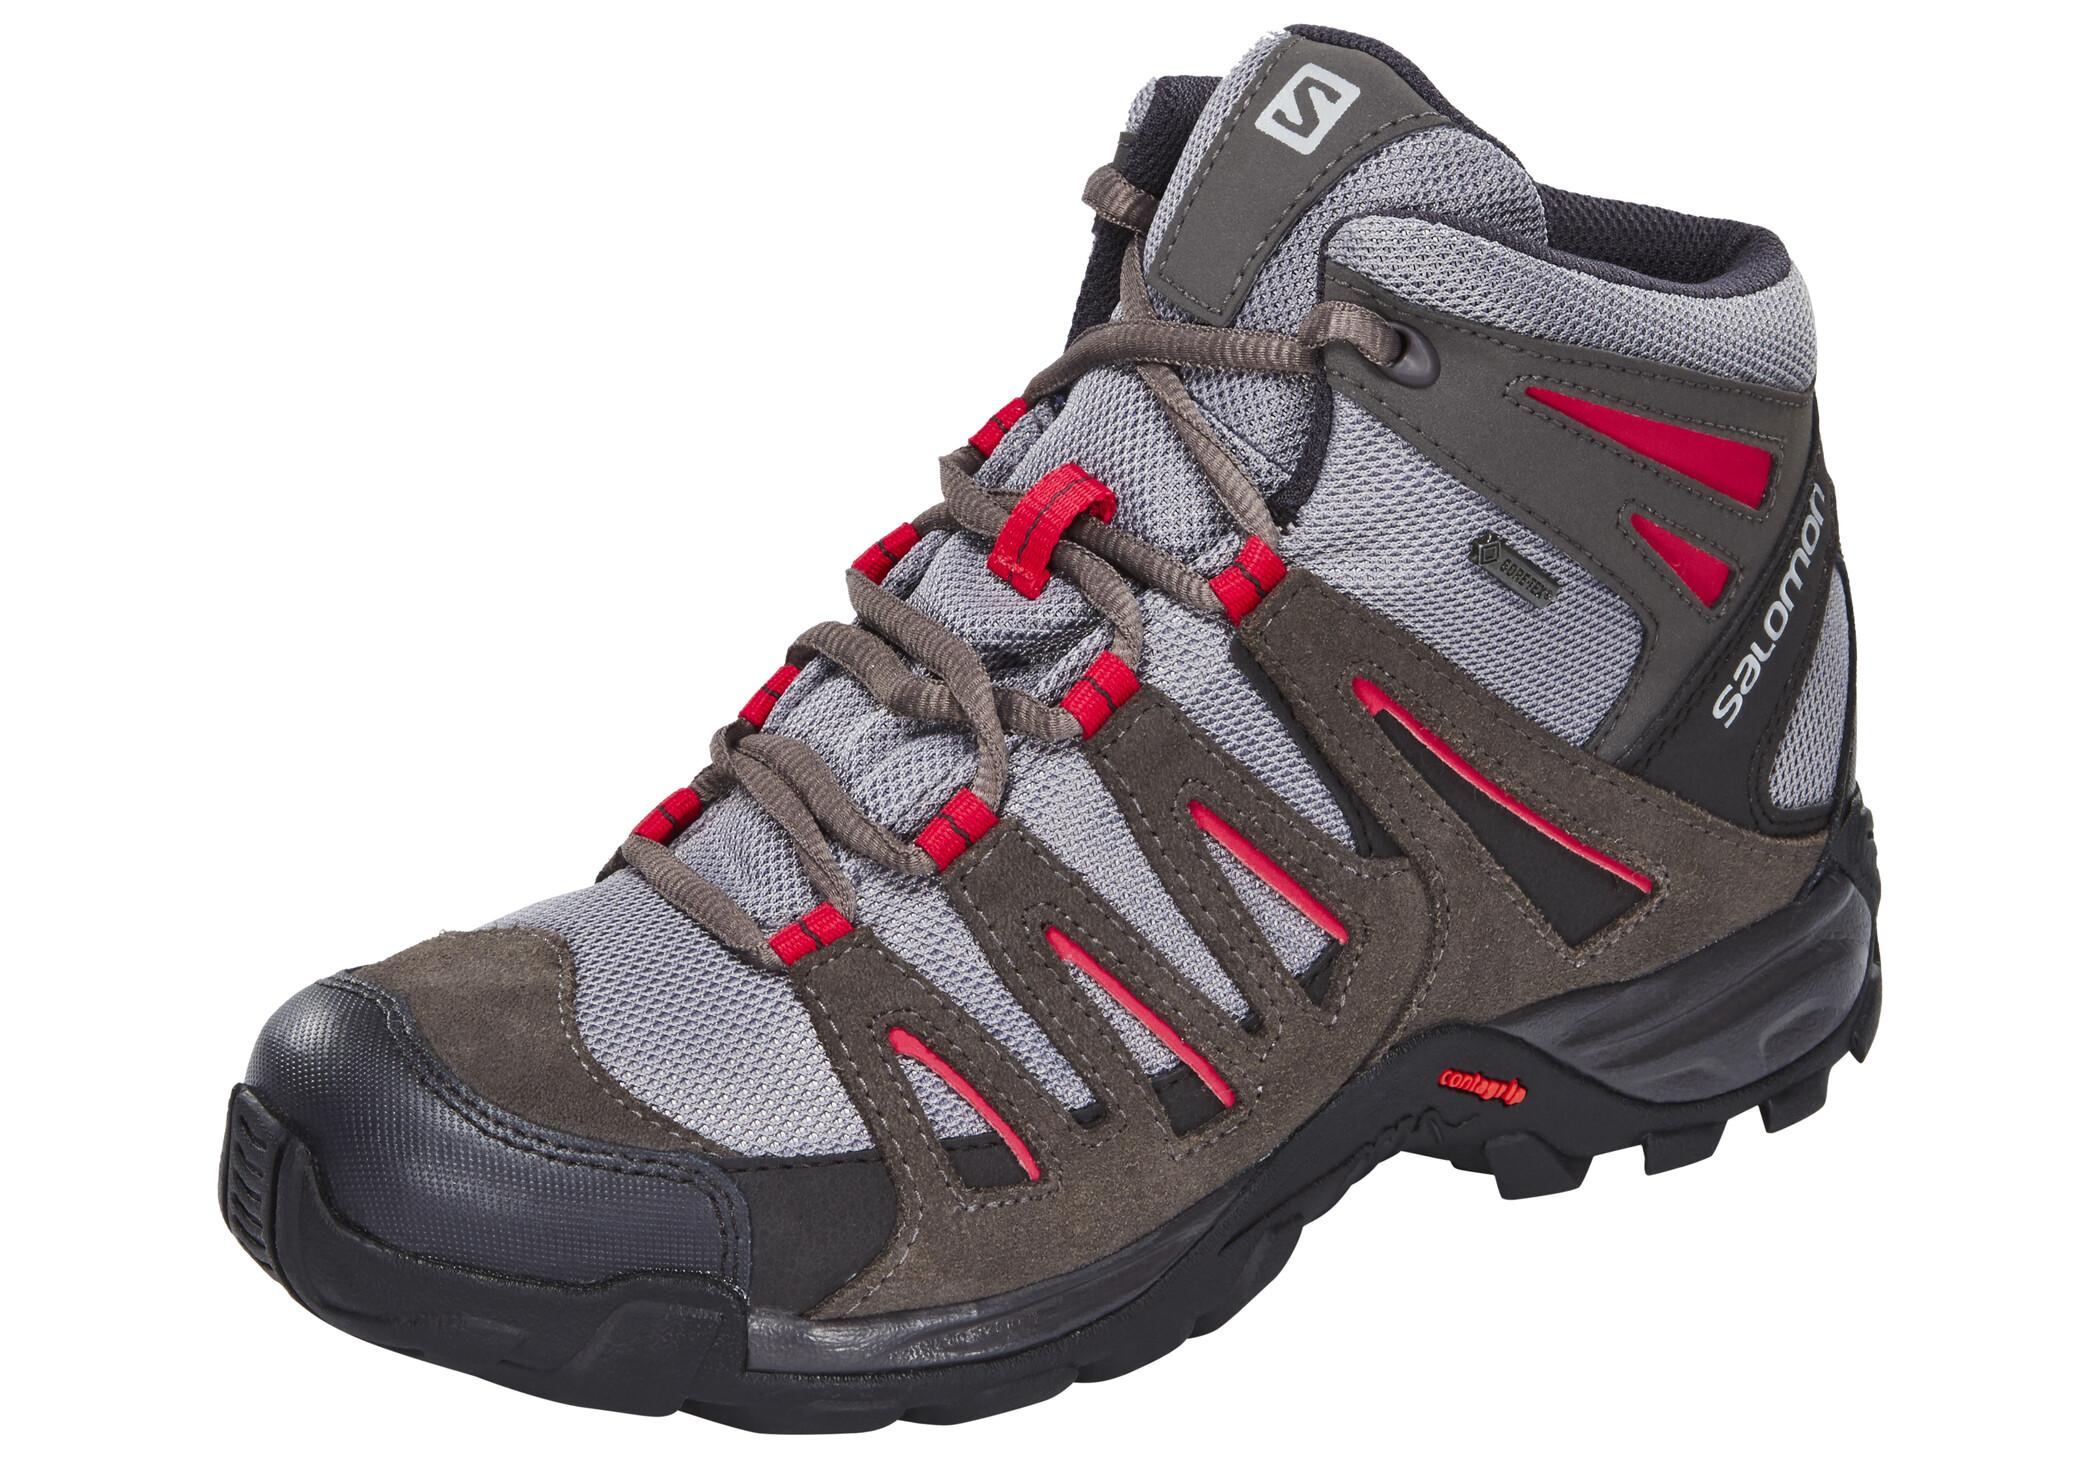 Salomon Ridgeback Mid GTX Schuhe Damen detroitautobahnlotus